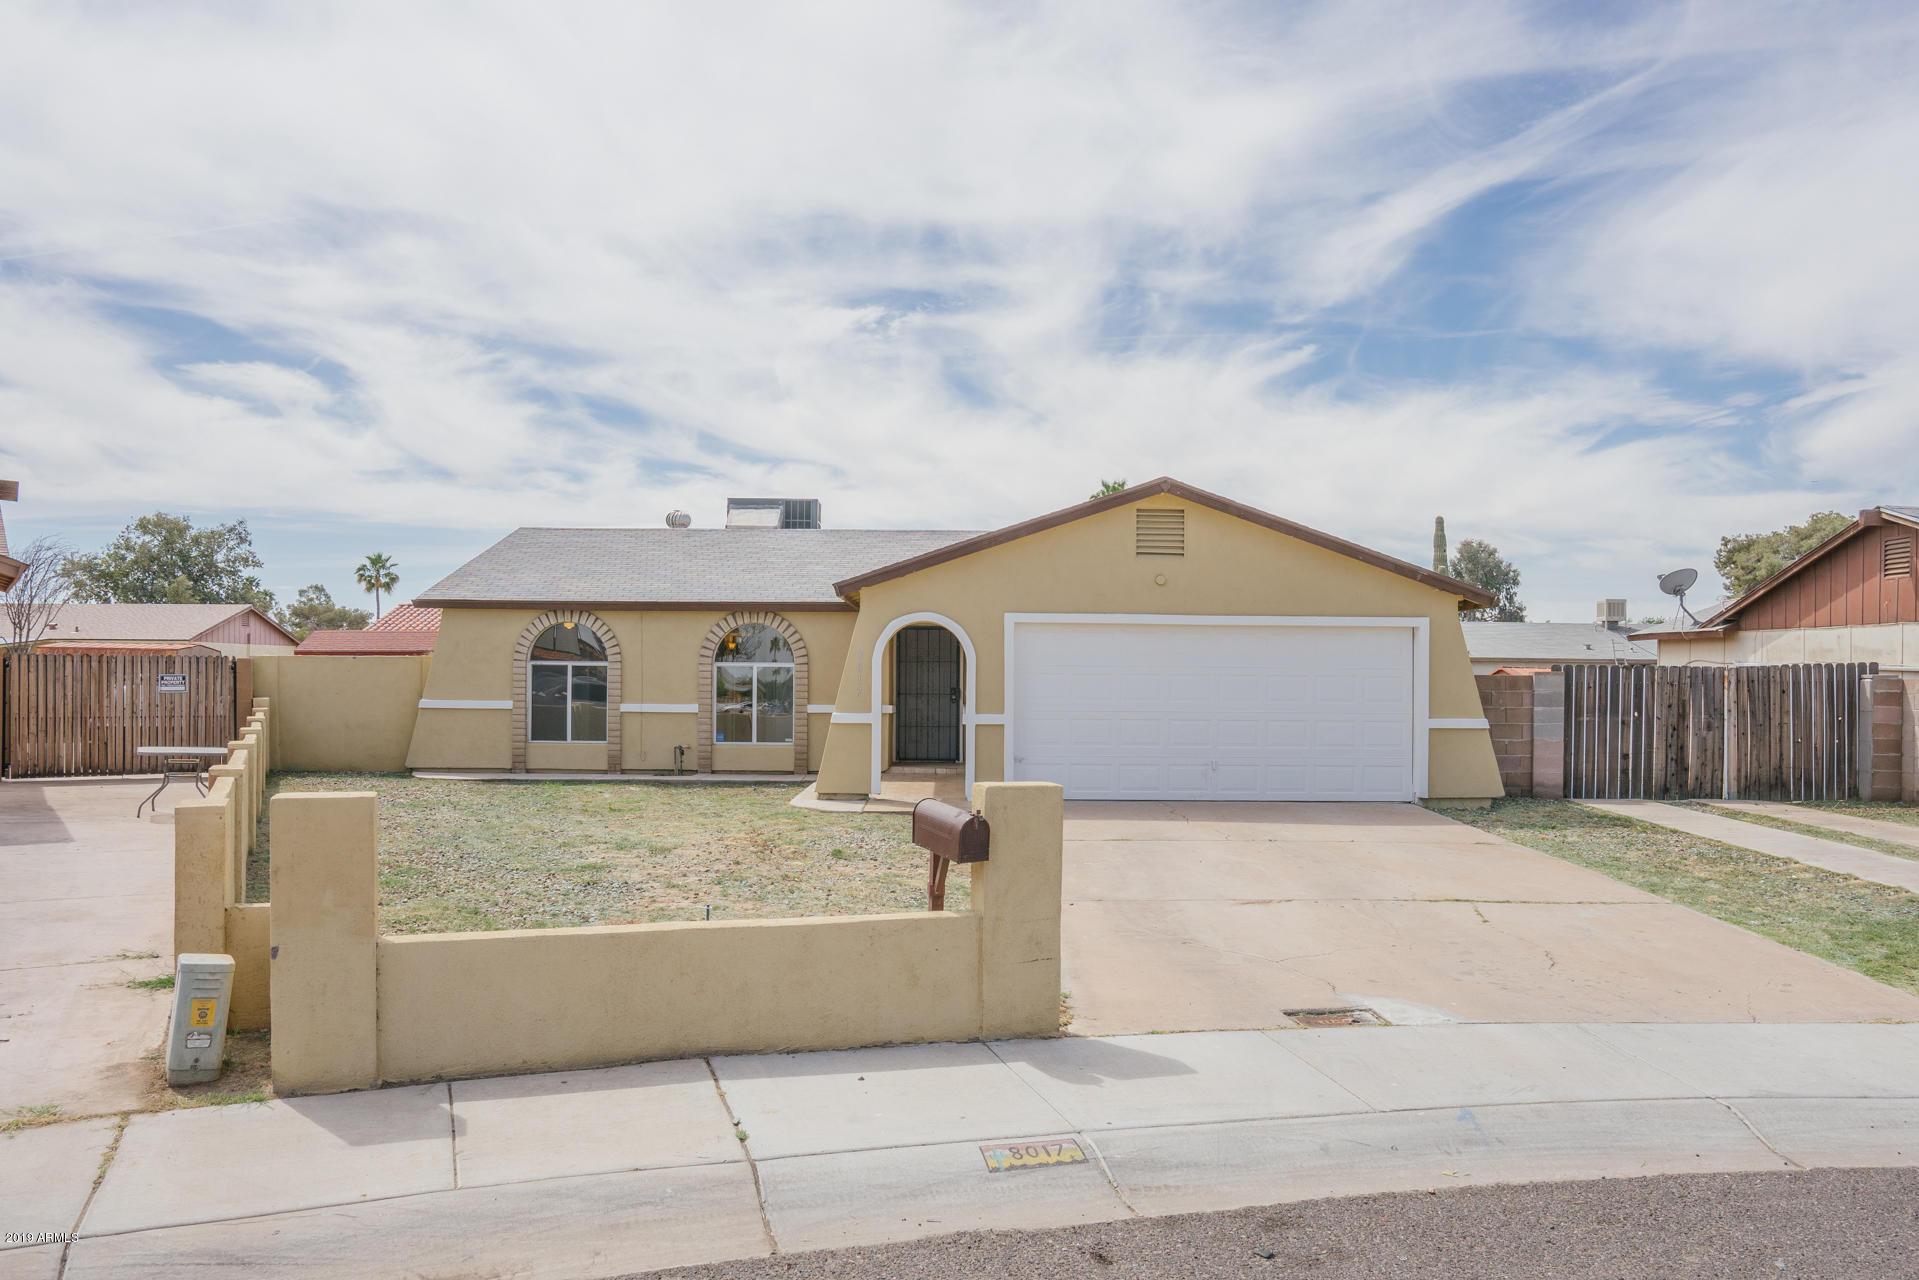 Photo for 8017 W Meadowbrook Avenue, Phoenix, AZ 85033 (MLS # 5911968)